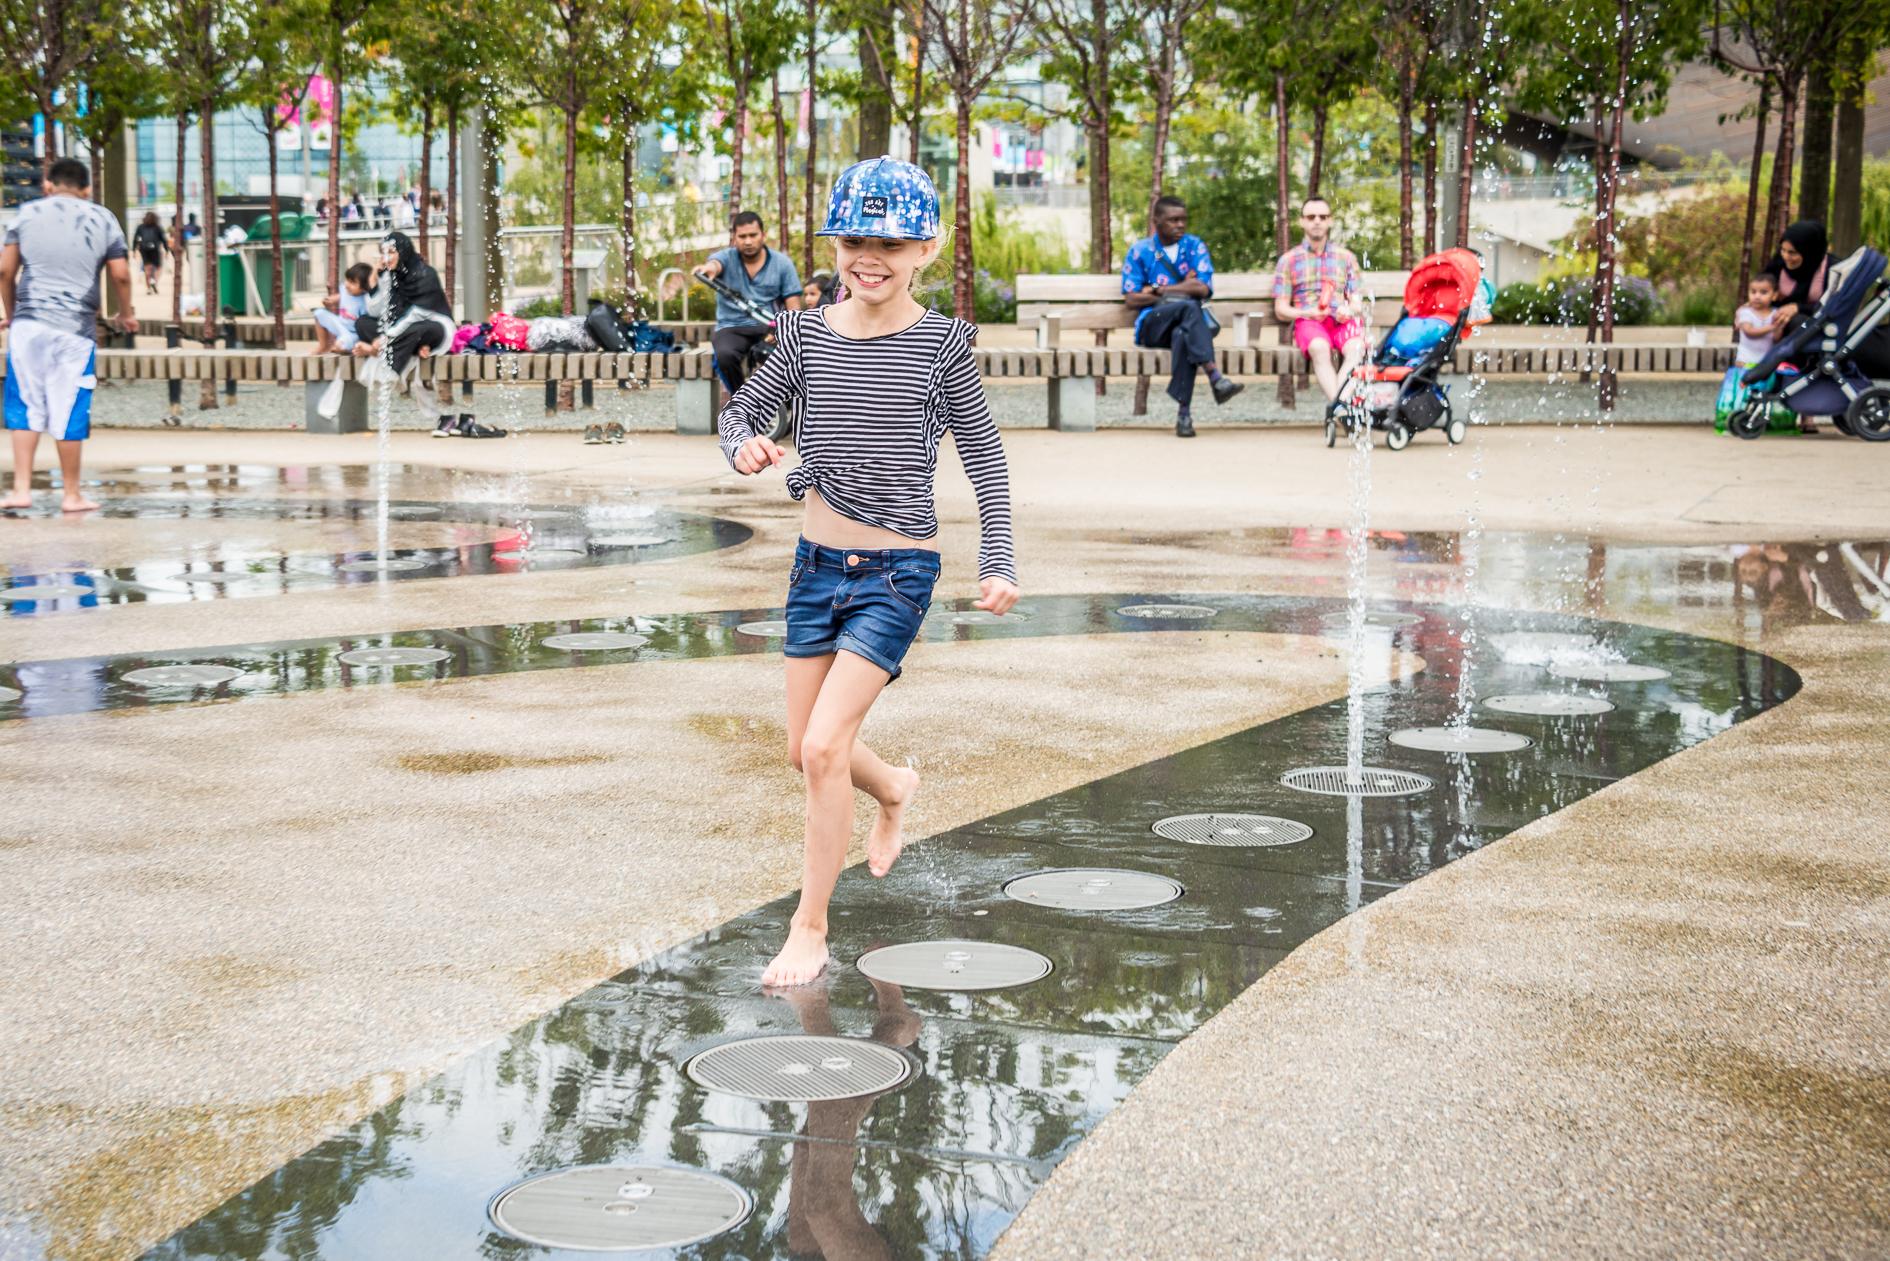 runnin-kids-fun-portrait-lifestyle